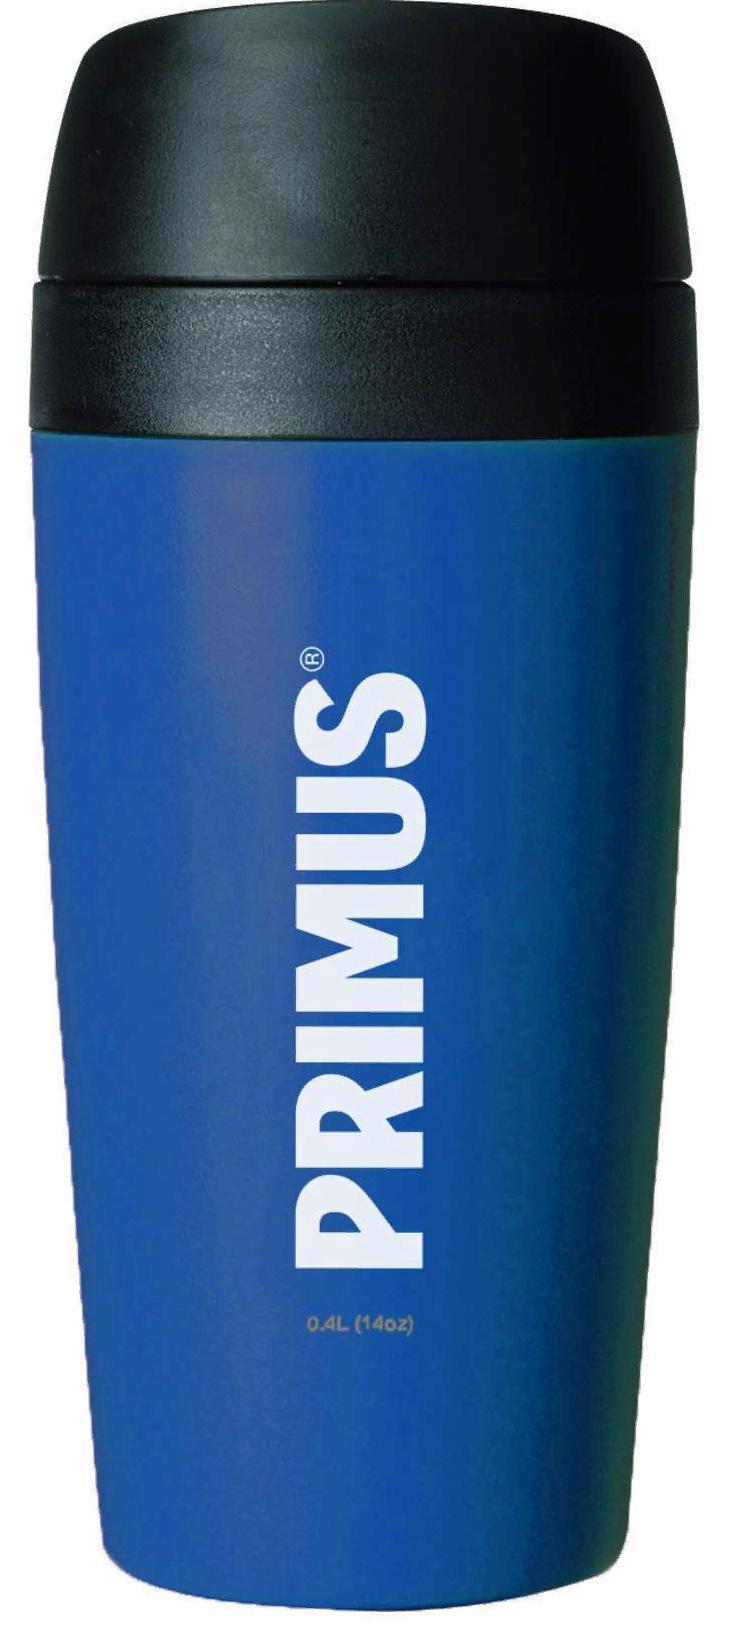 Термокружка Primus Commuter mug 0.4 Deep Blue, Посуда - арт. 1044140196